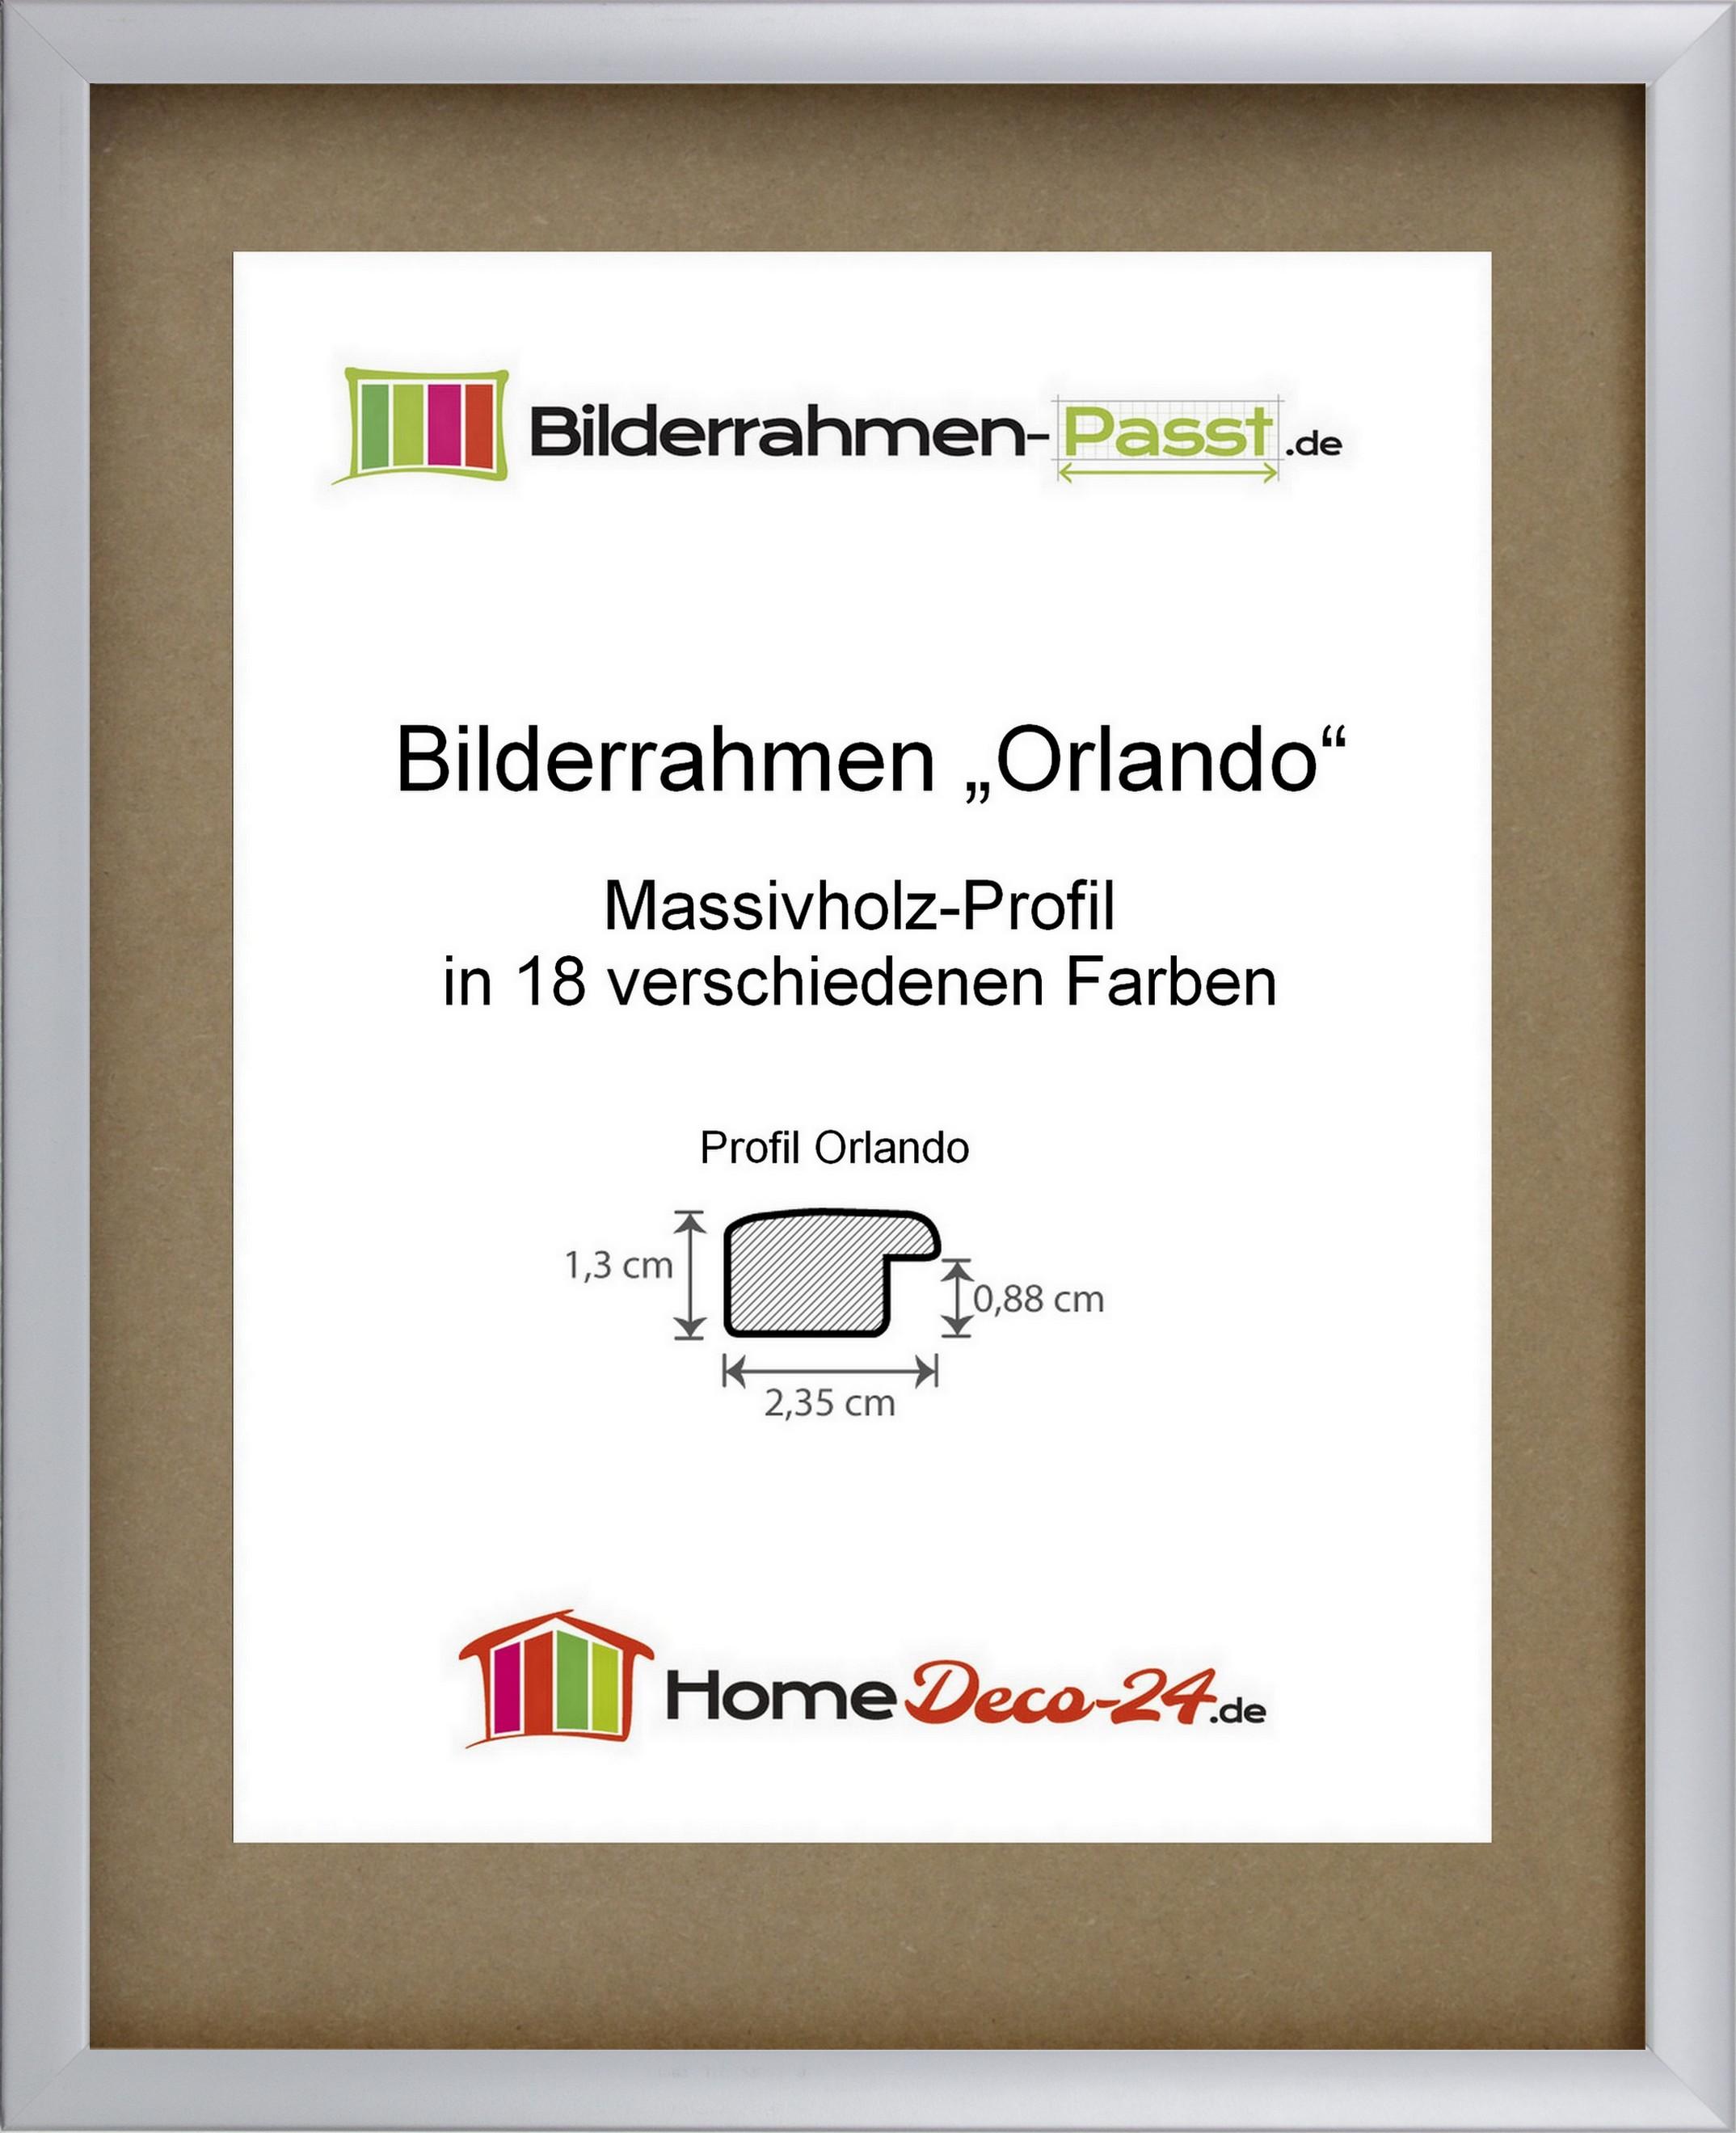 orlando massivholz bilderrahmen farbwahl gr ssenwahl standard gr ssen h neu ebay. Black Bedroom Furniture Sets. Home Design Ideas